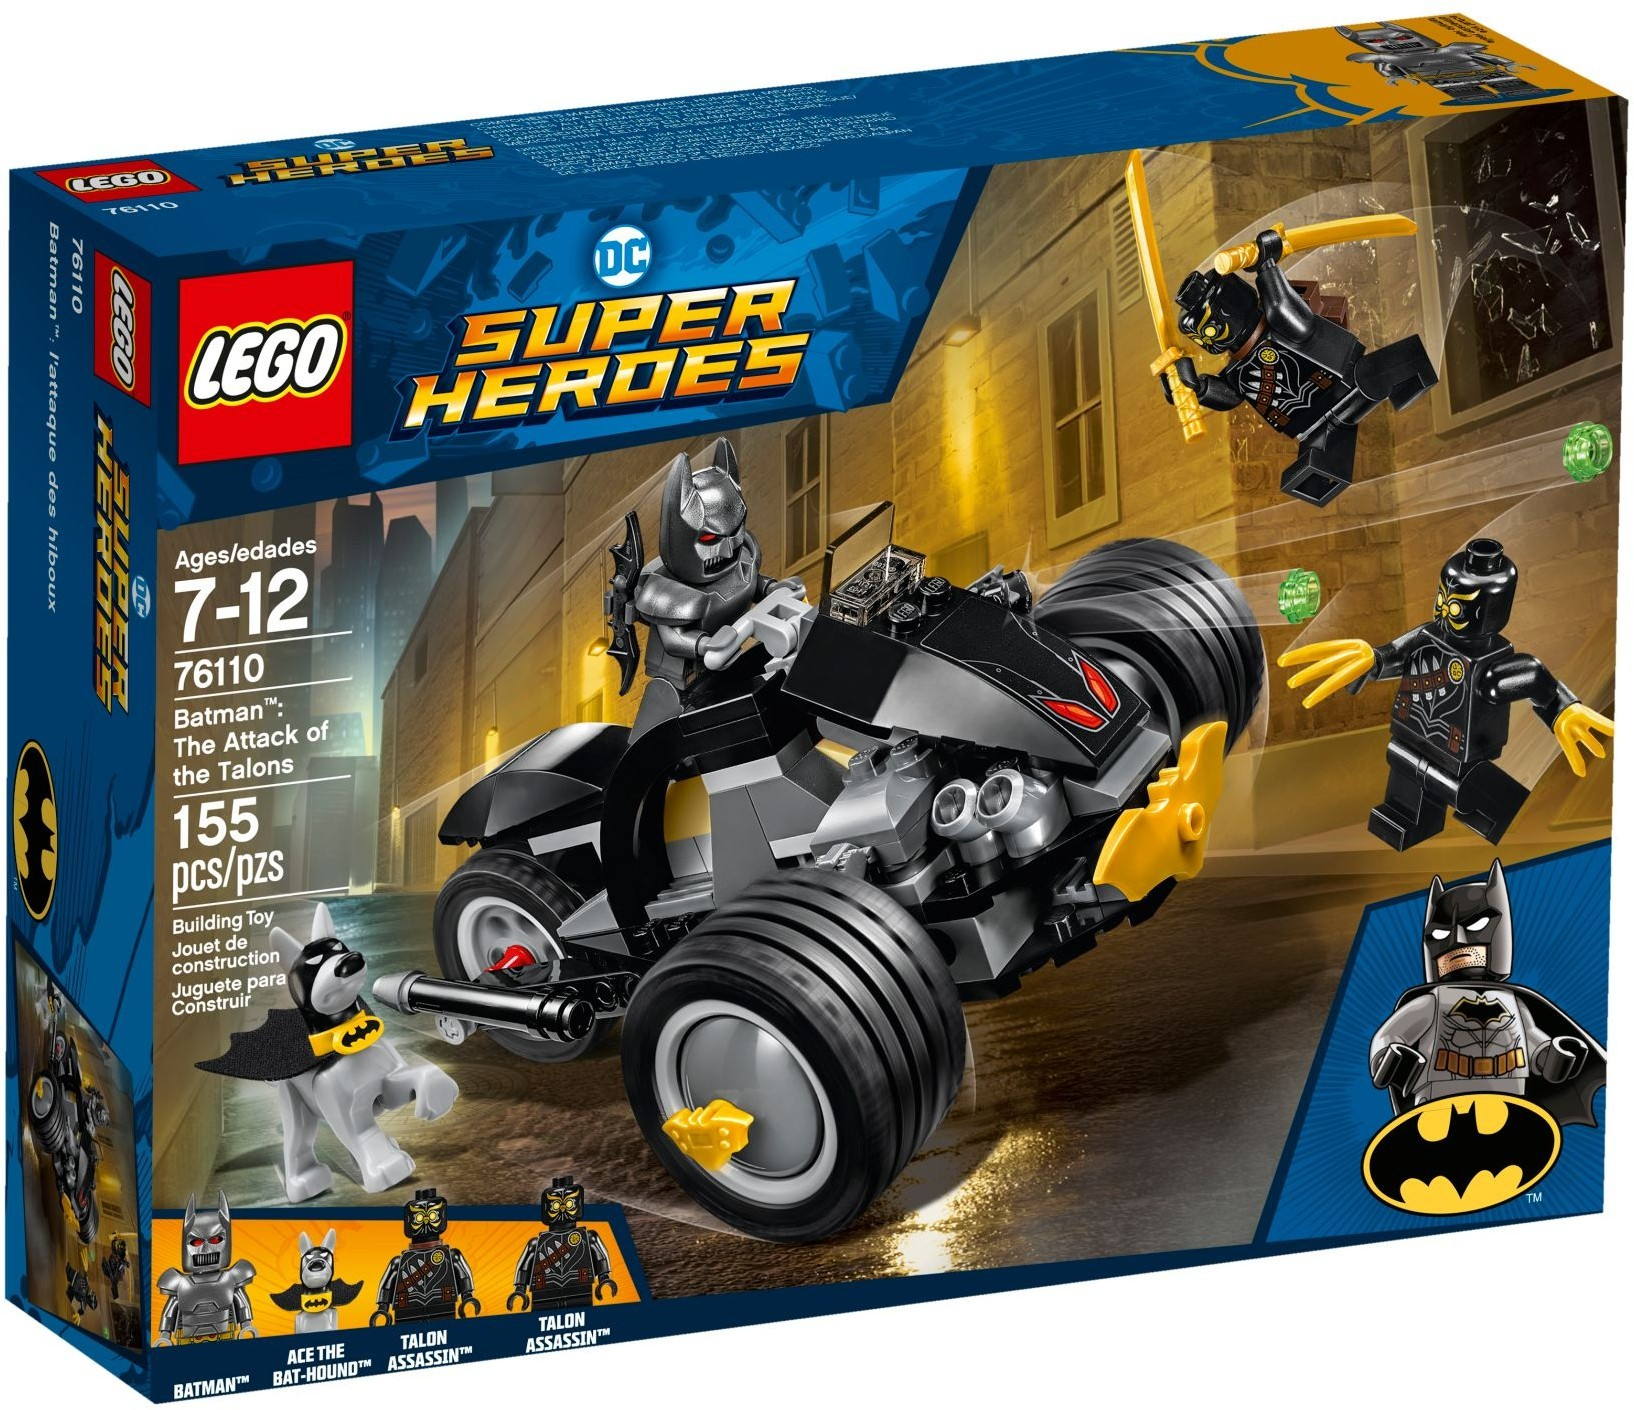 Heavy Armor Minifigure NEW DC Superhero 76110 Mini Figure LEGO Batman